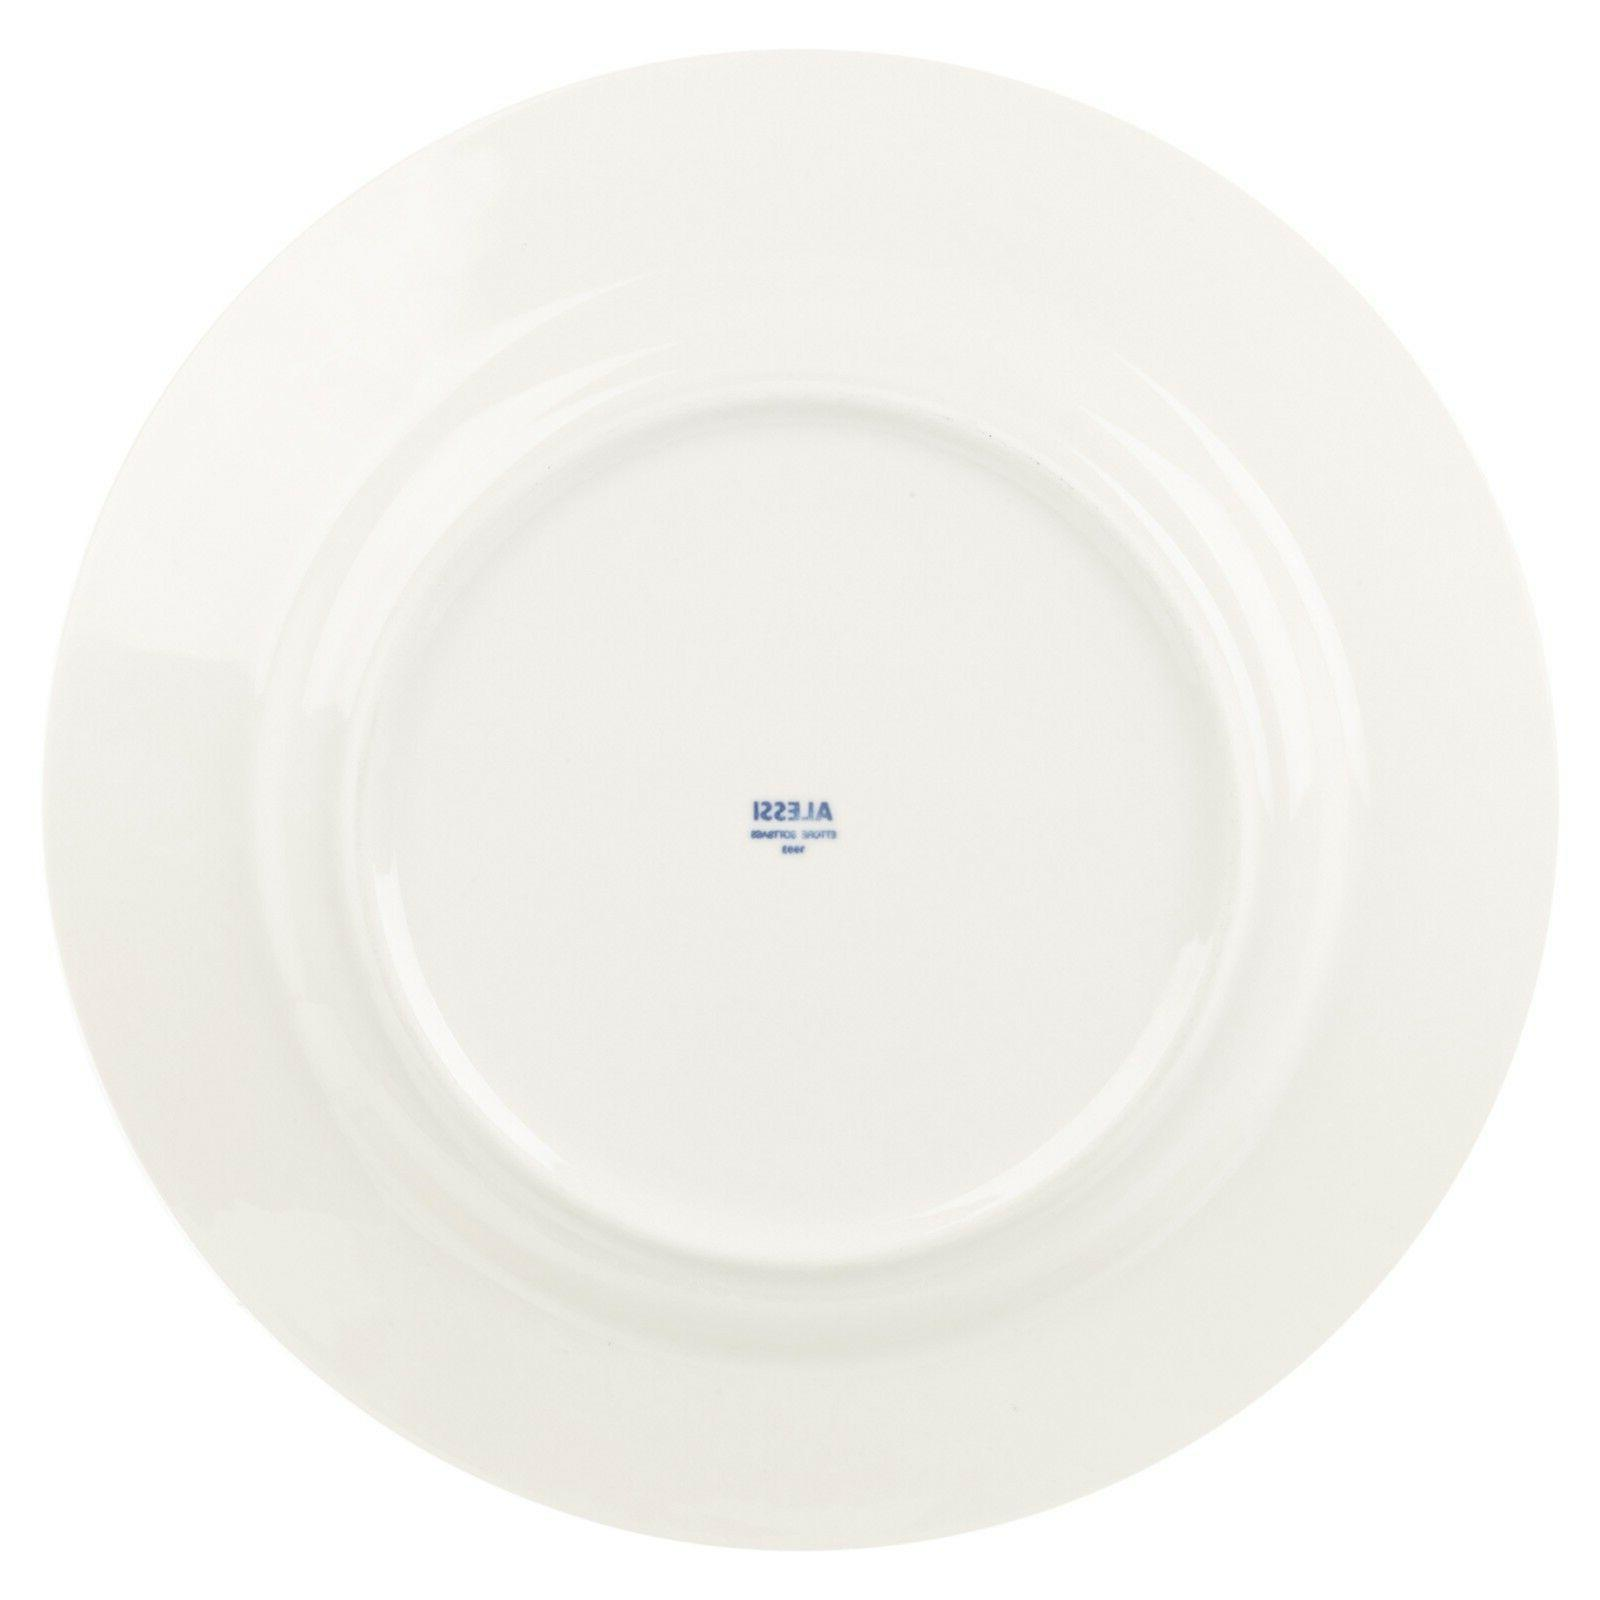 Service Tableware Plate Bowl Set